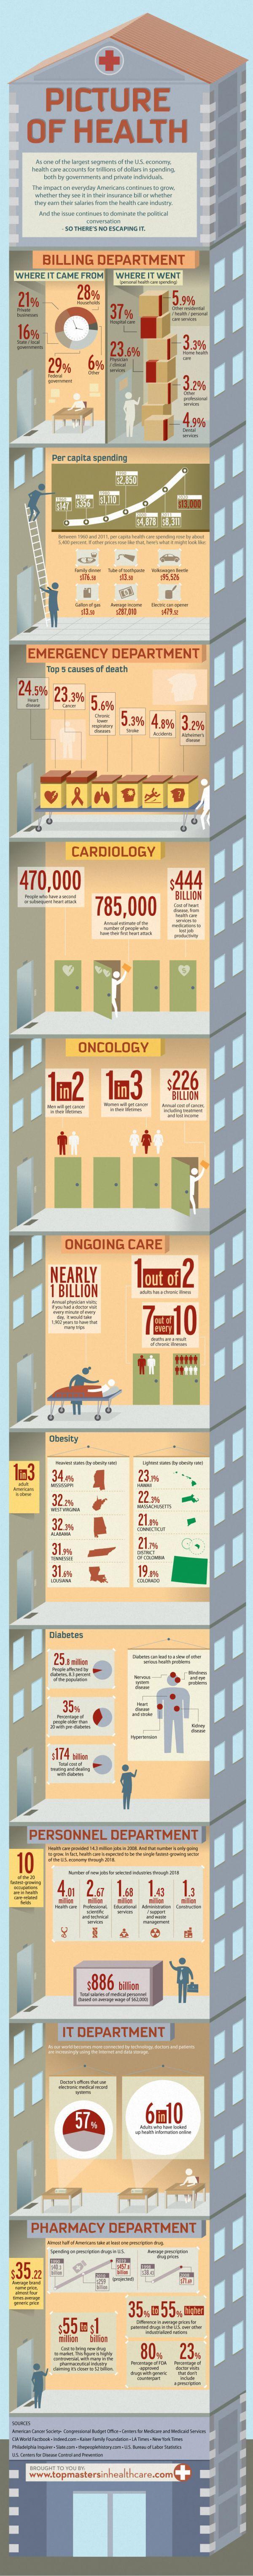 Infographic: Inside Healthcare Spending in America   telemedicine mHealth infographic healthcare spending